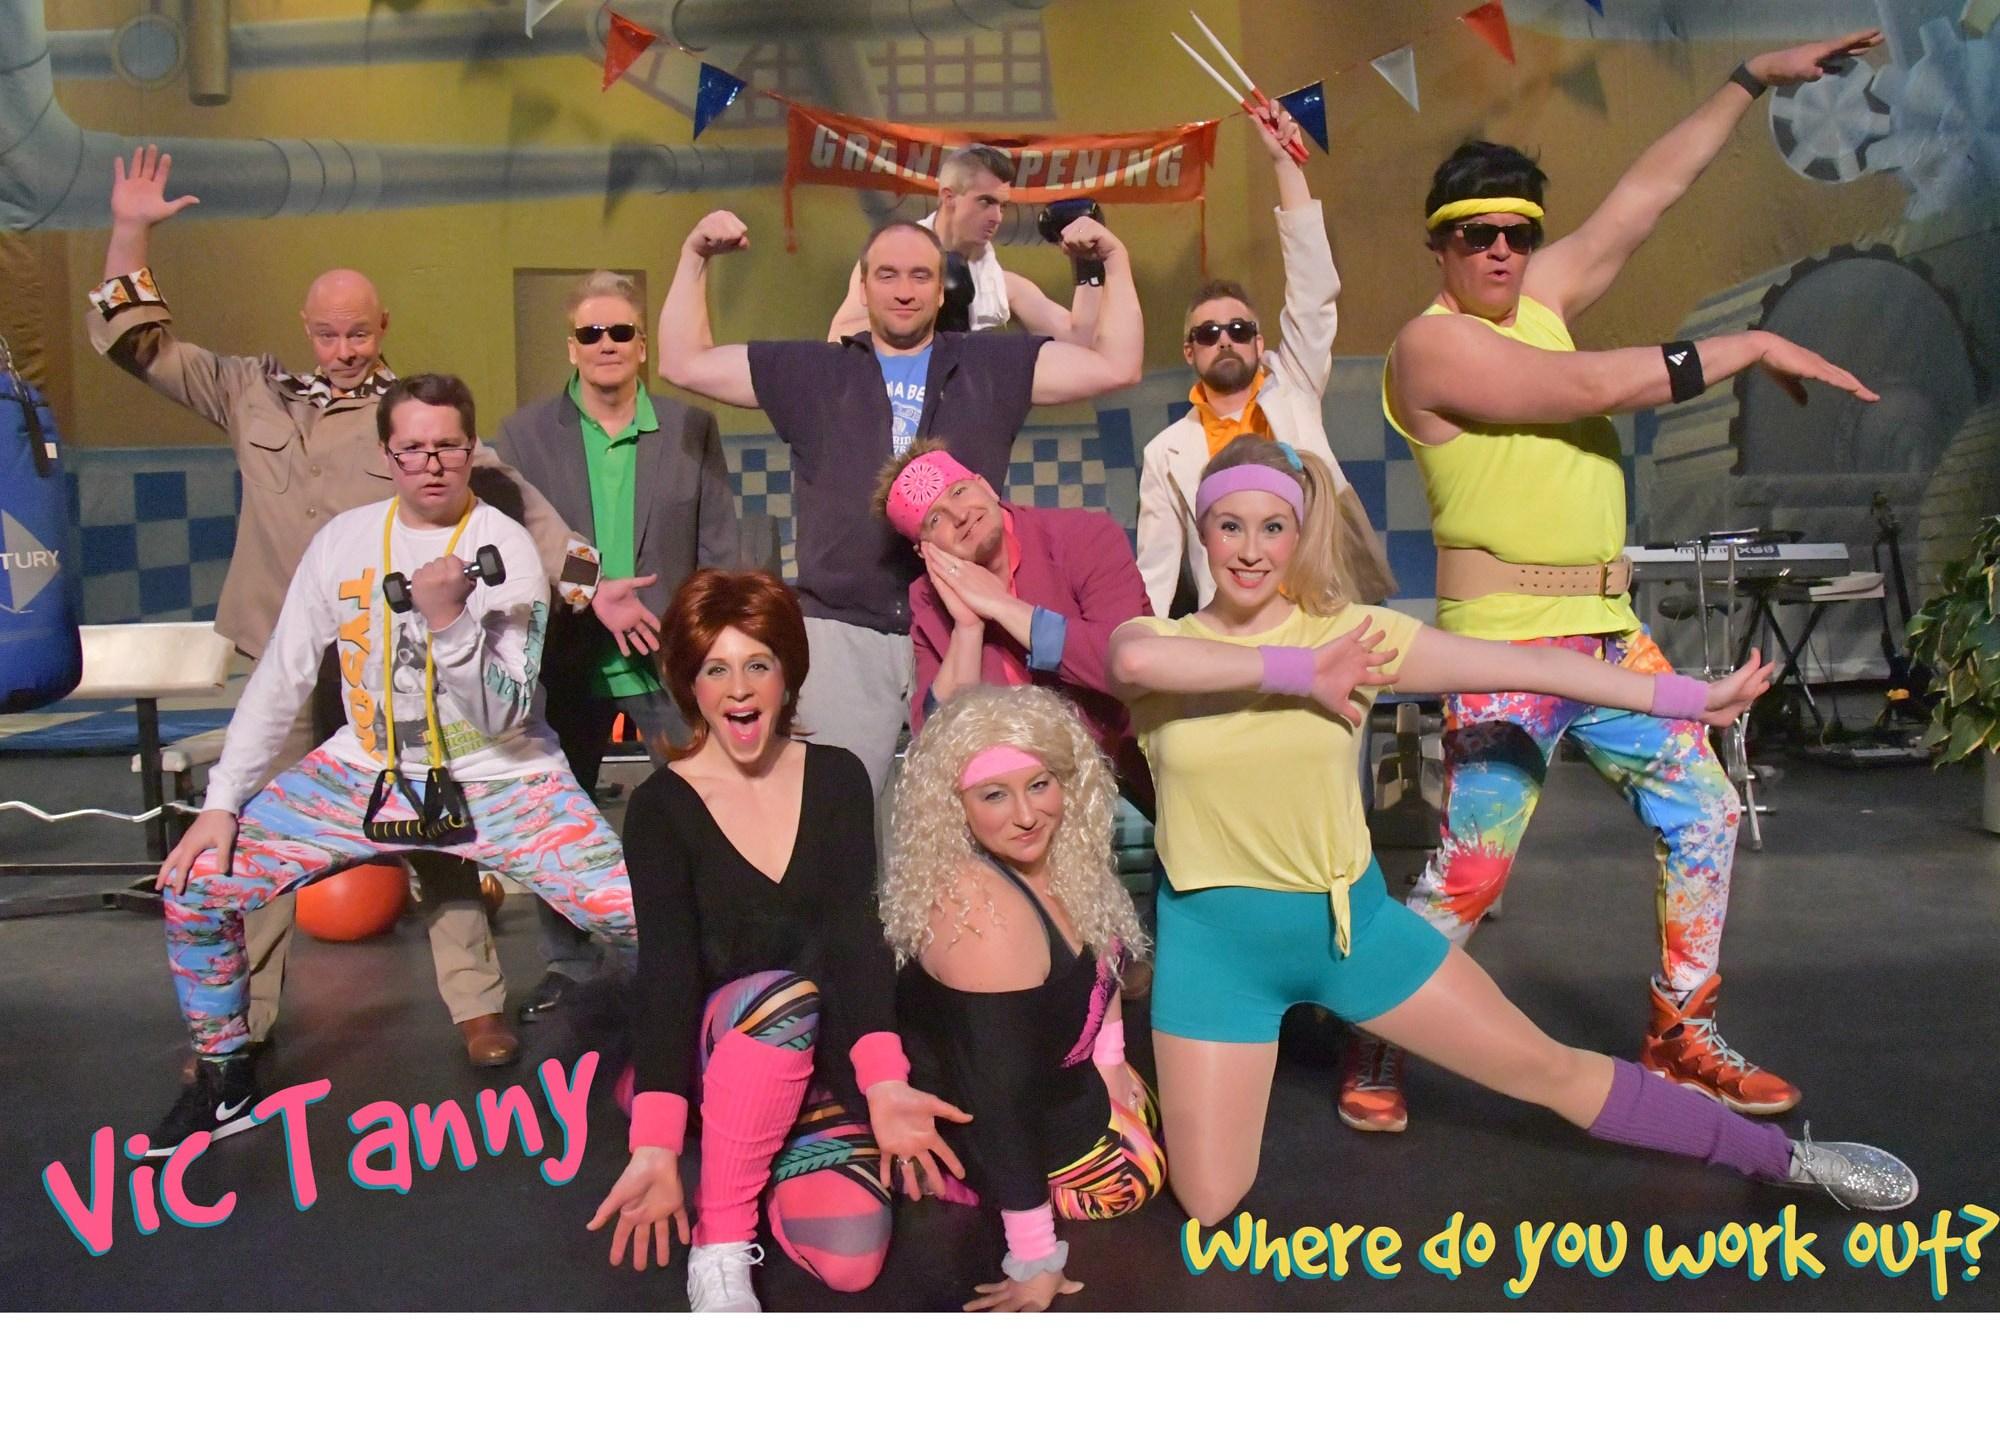 Let Me Be Frank Productions Vic Tanny company_1554640243948.jpg.jpg